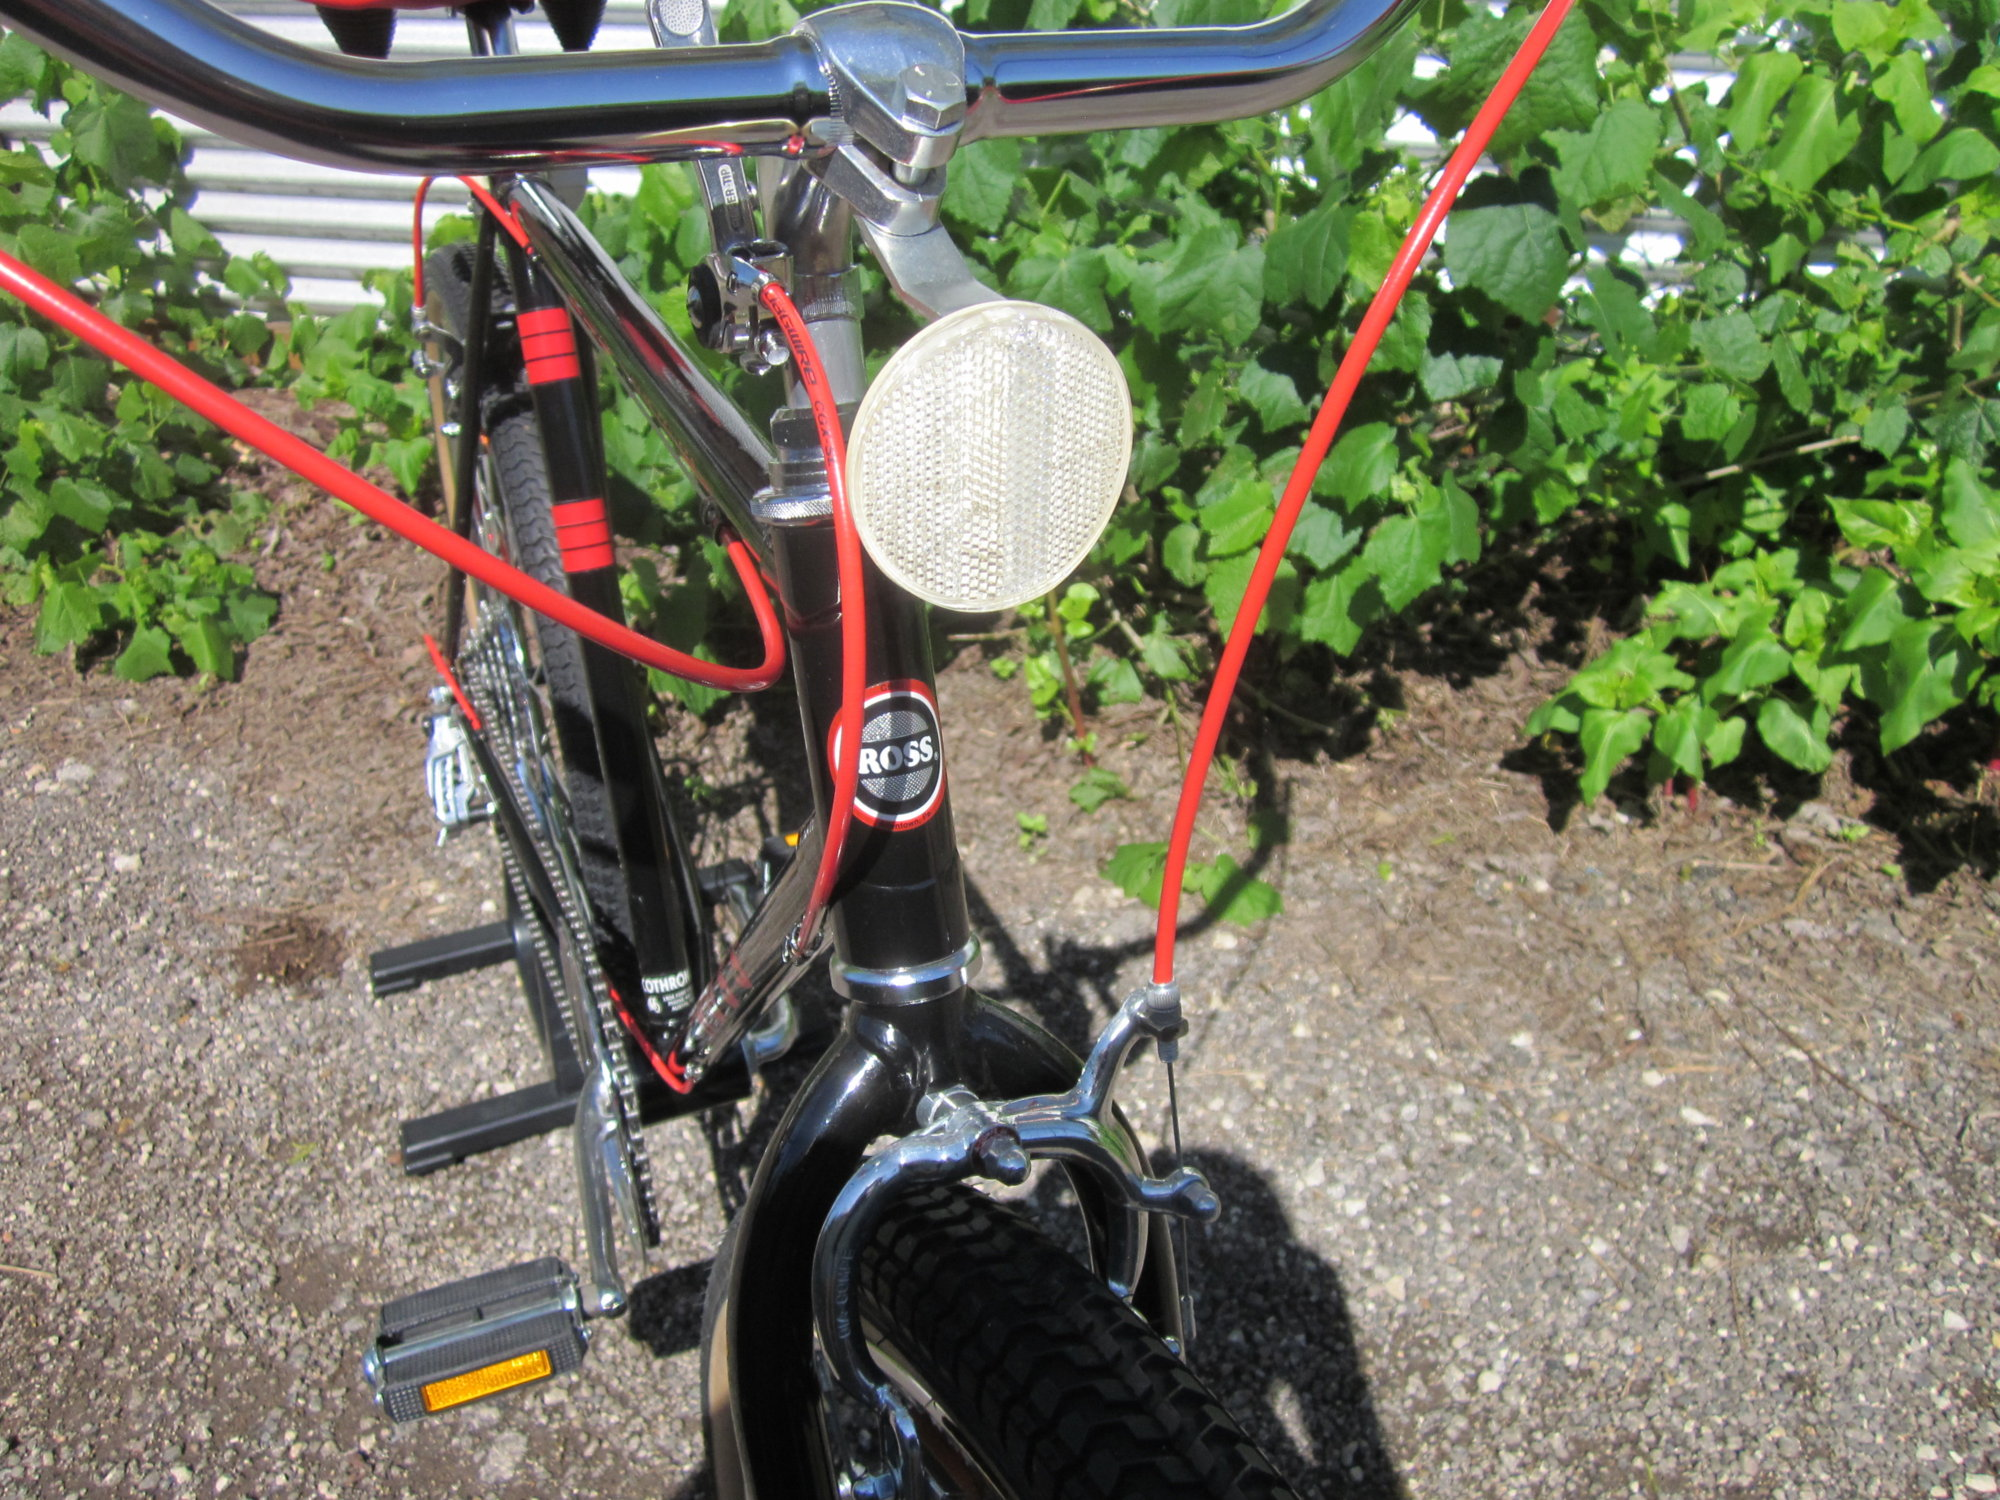 Ross Bike 004.JPG